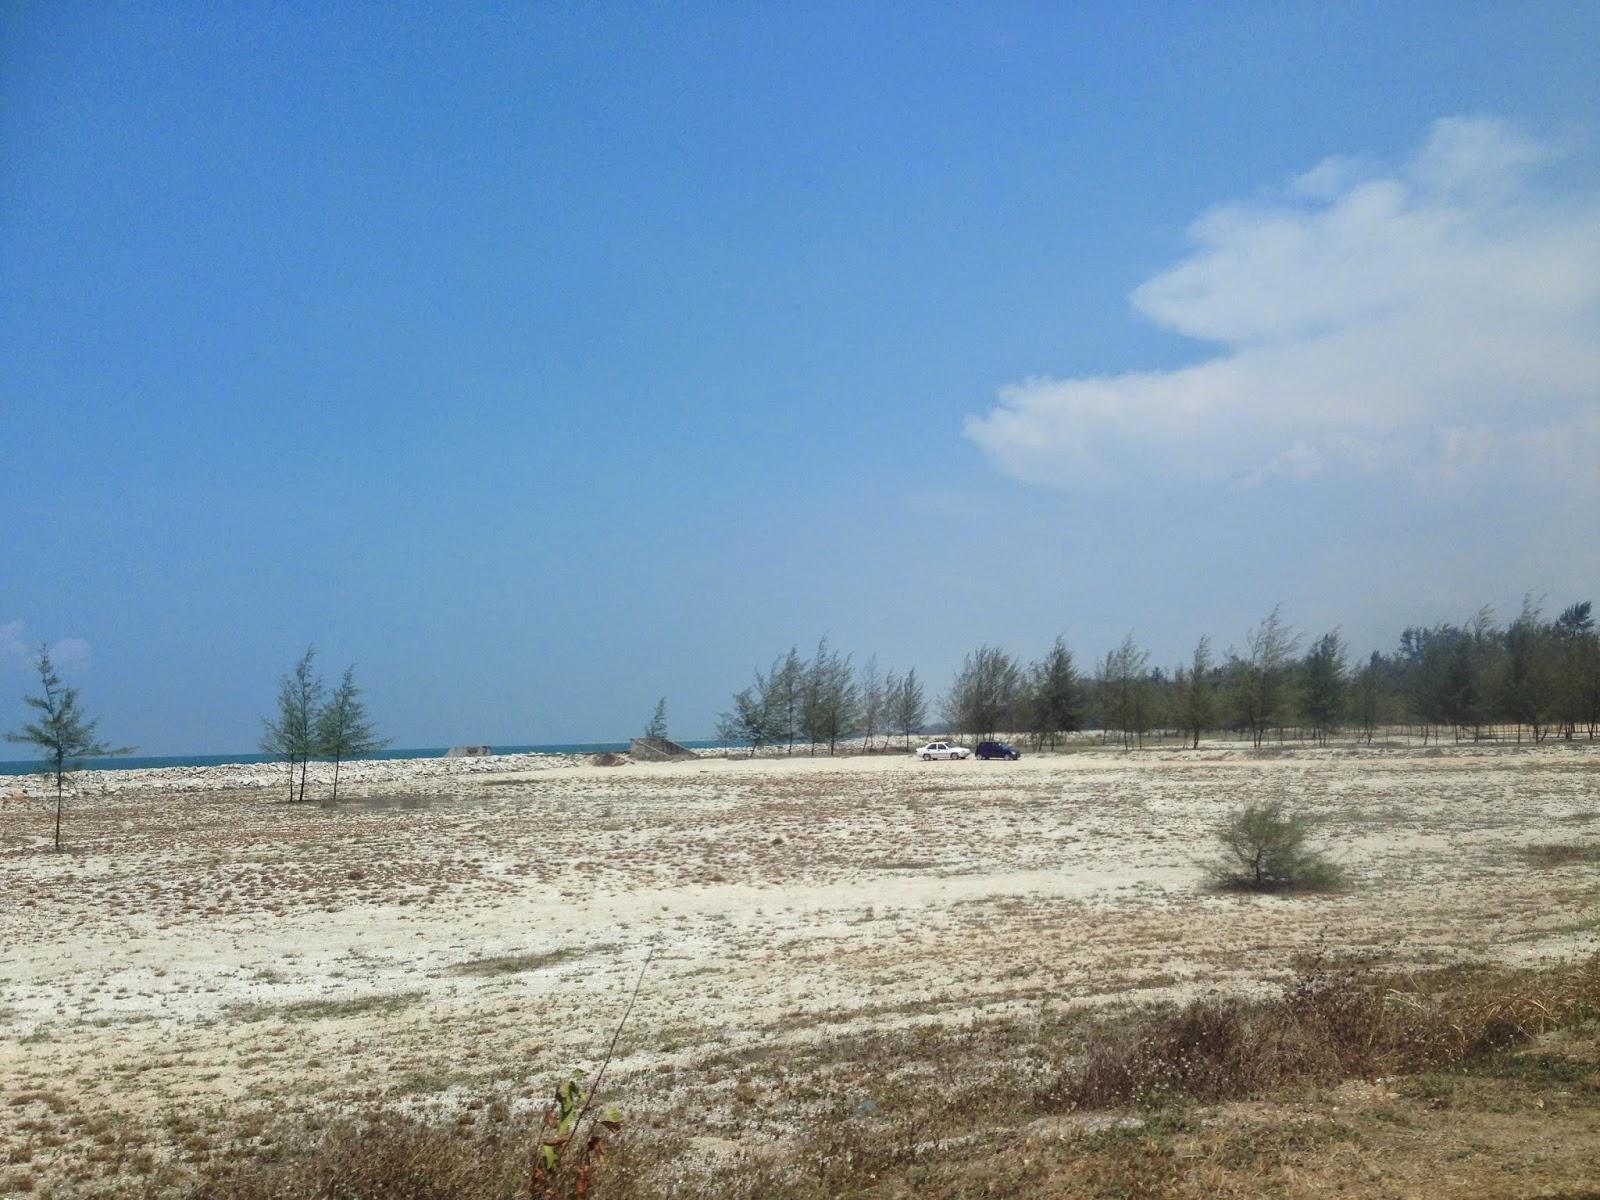 Pantai Teluk Ketapang